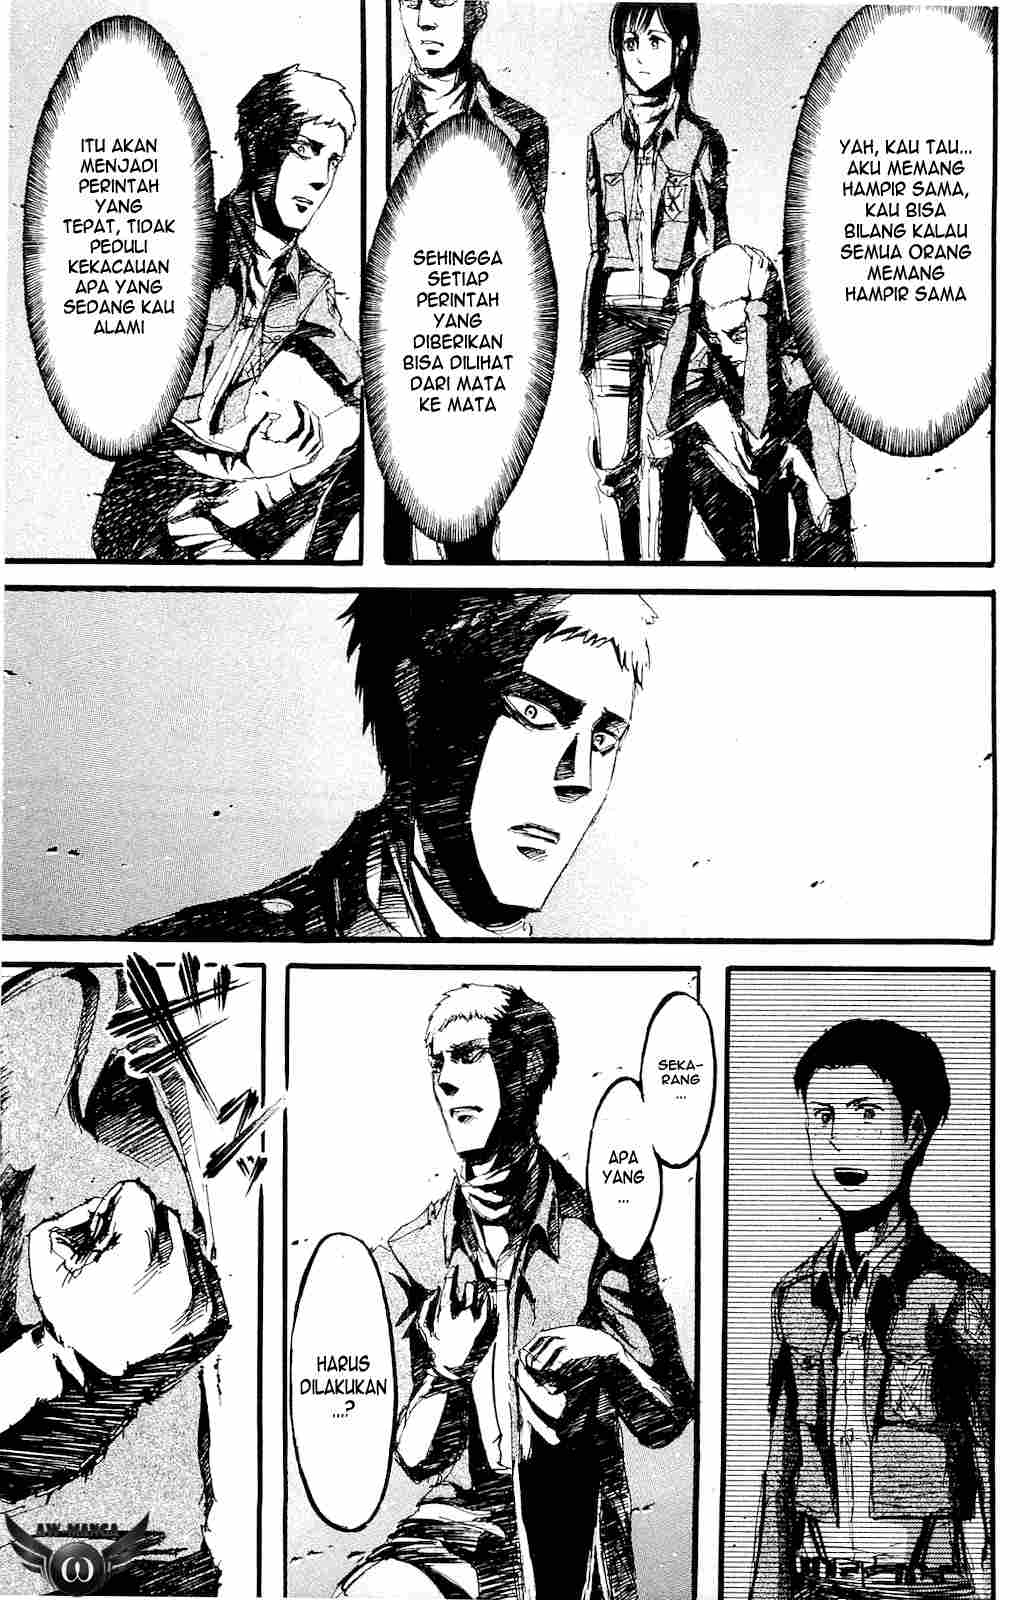 Komik shingeki no kyojin 018 - sekarang apa yang harus dilakukan 19 Indonesia shingeki no kyojin 018 - sekarang apa yang harus dilakukan Terbaru 30|Baca Manga Komik Indonesia|